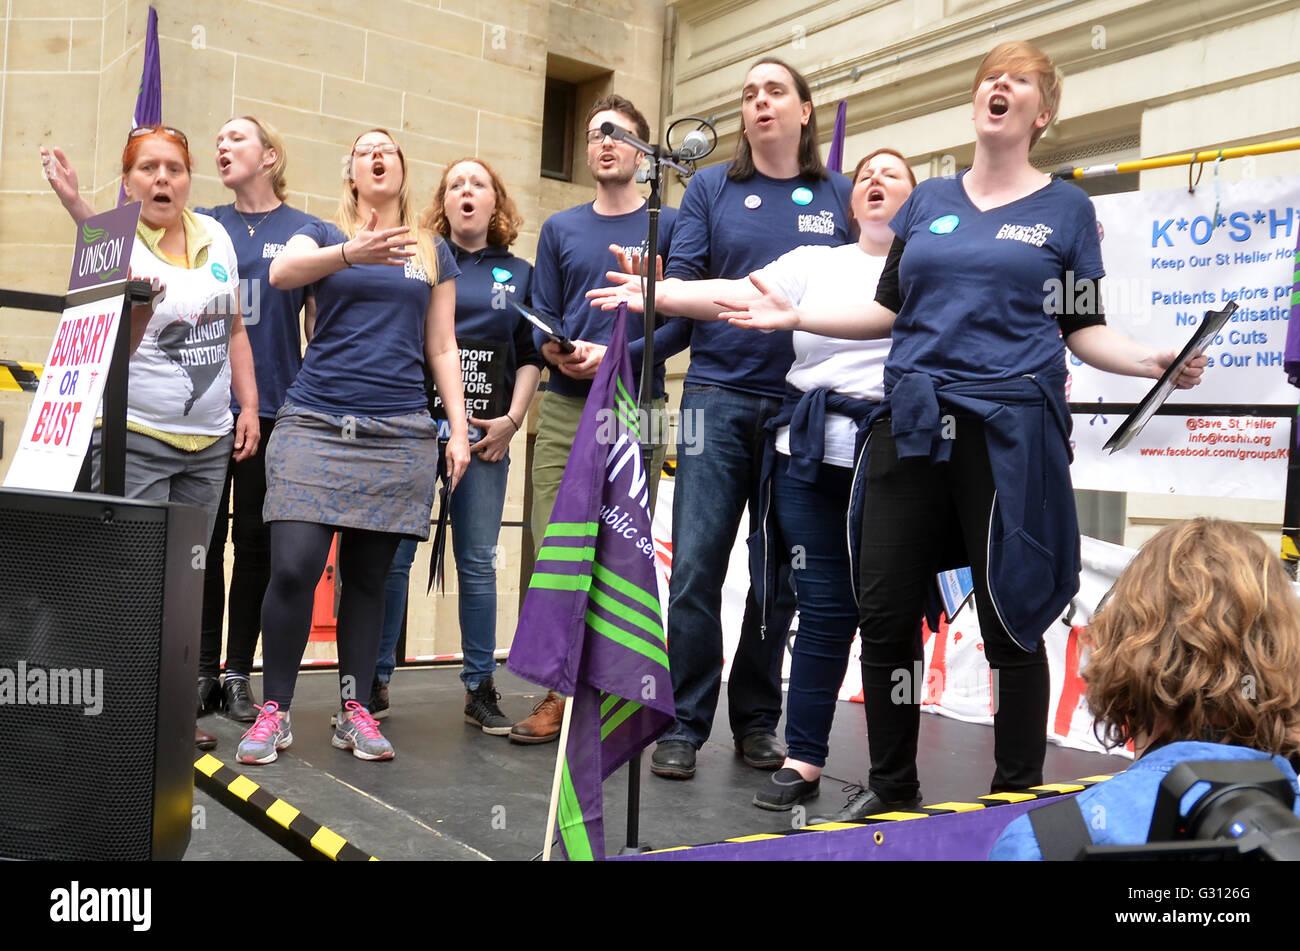 Department Health,Whitehall,London,UK.NHS choir perform.Nurses protest outside Richmond House Department Health - Stock Image